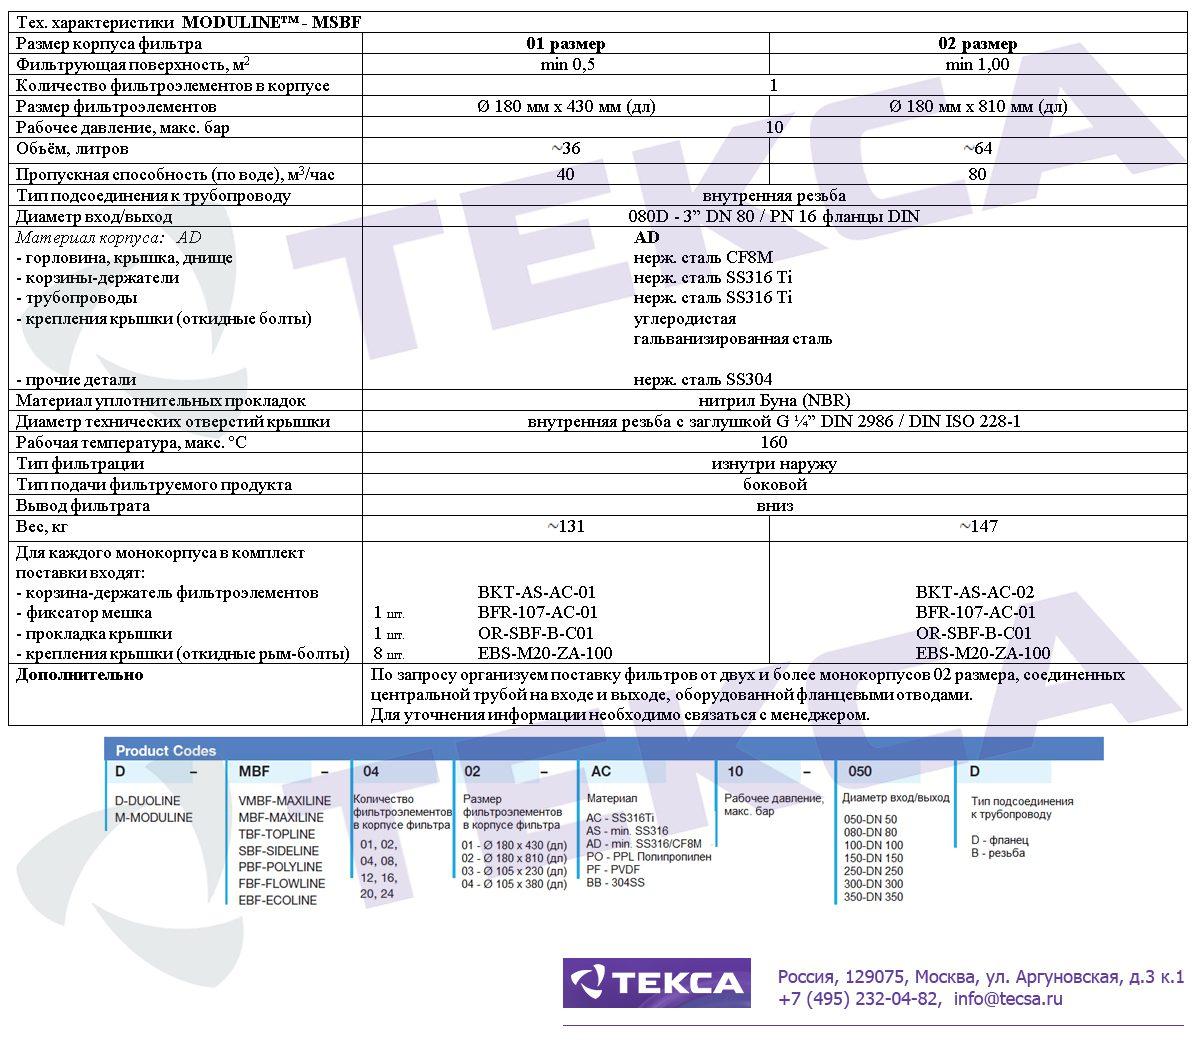 Технические характеристики фильтра MODULINE MSBF